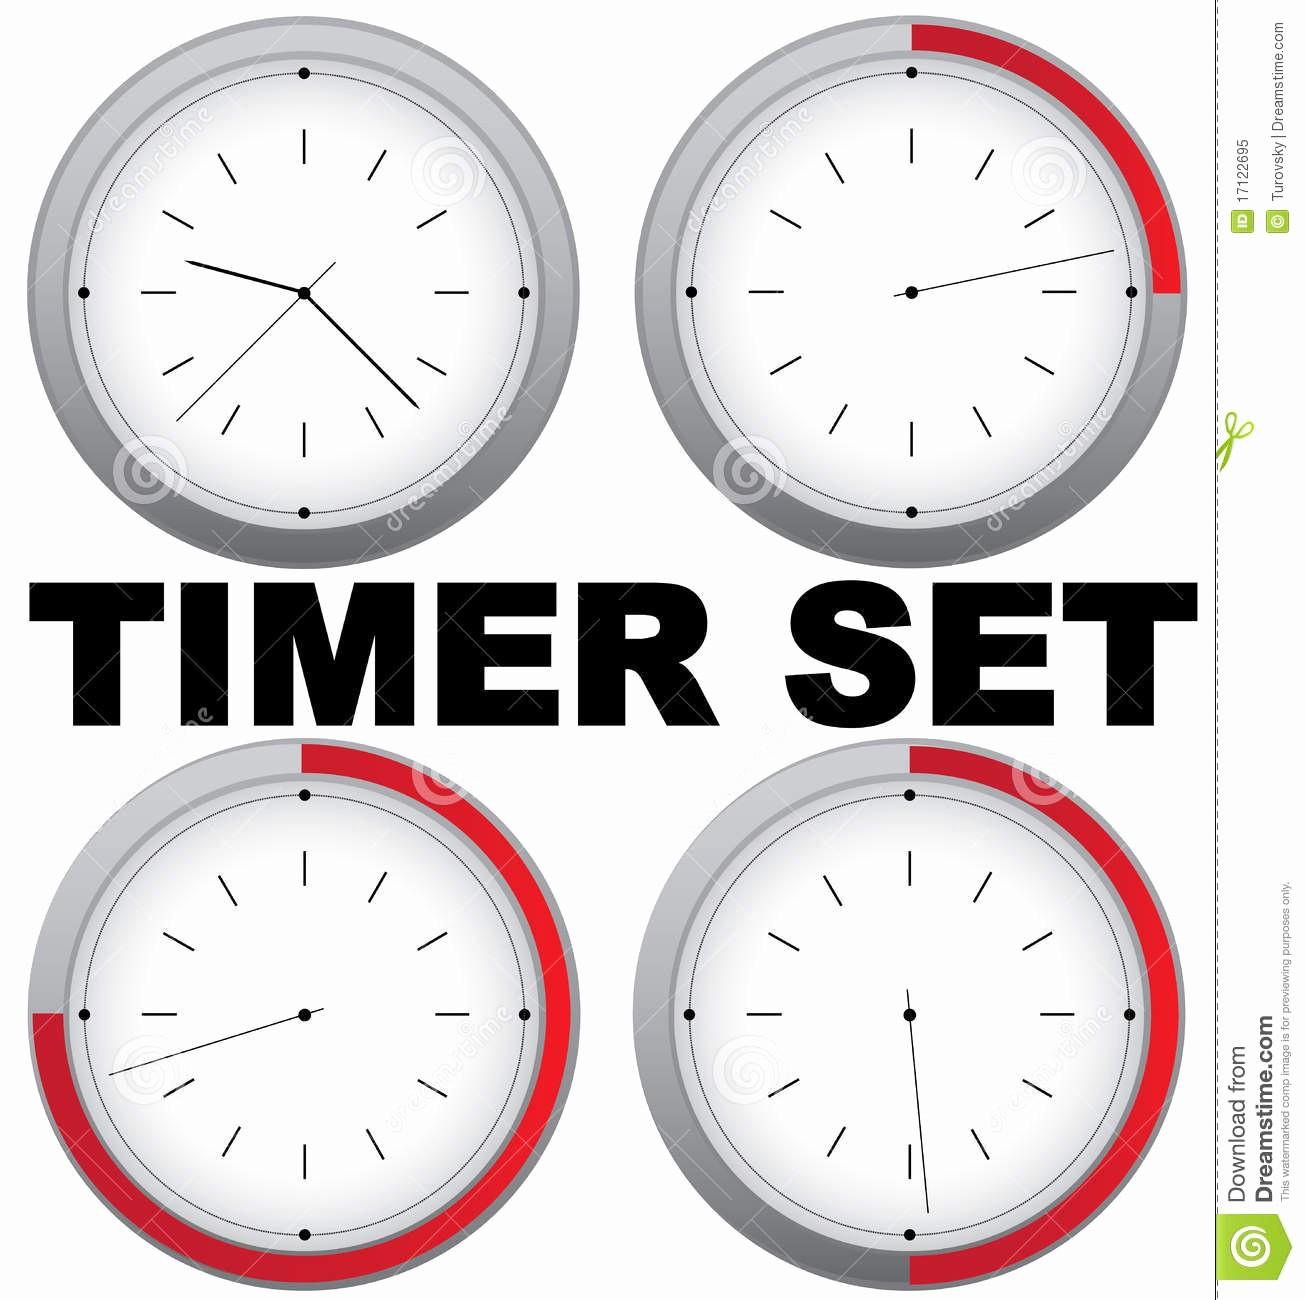 Set A 15 Min Timer Unique Timer Set Royalty Free Stock Image